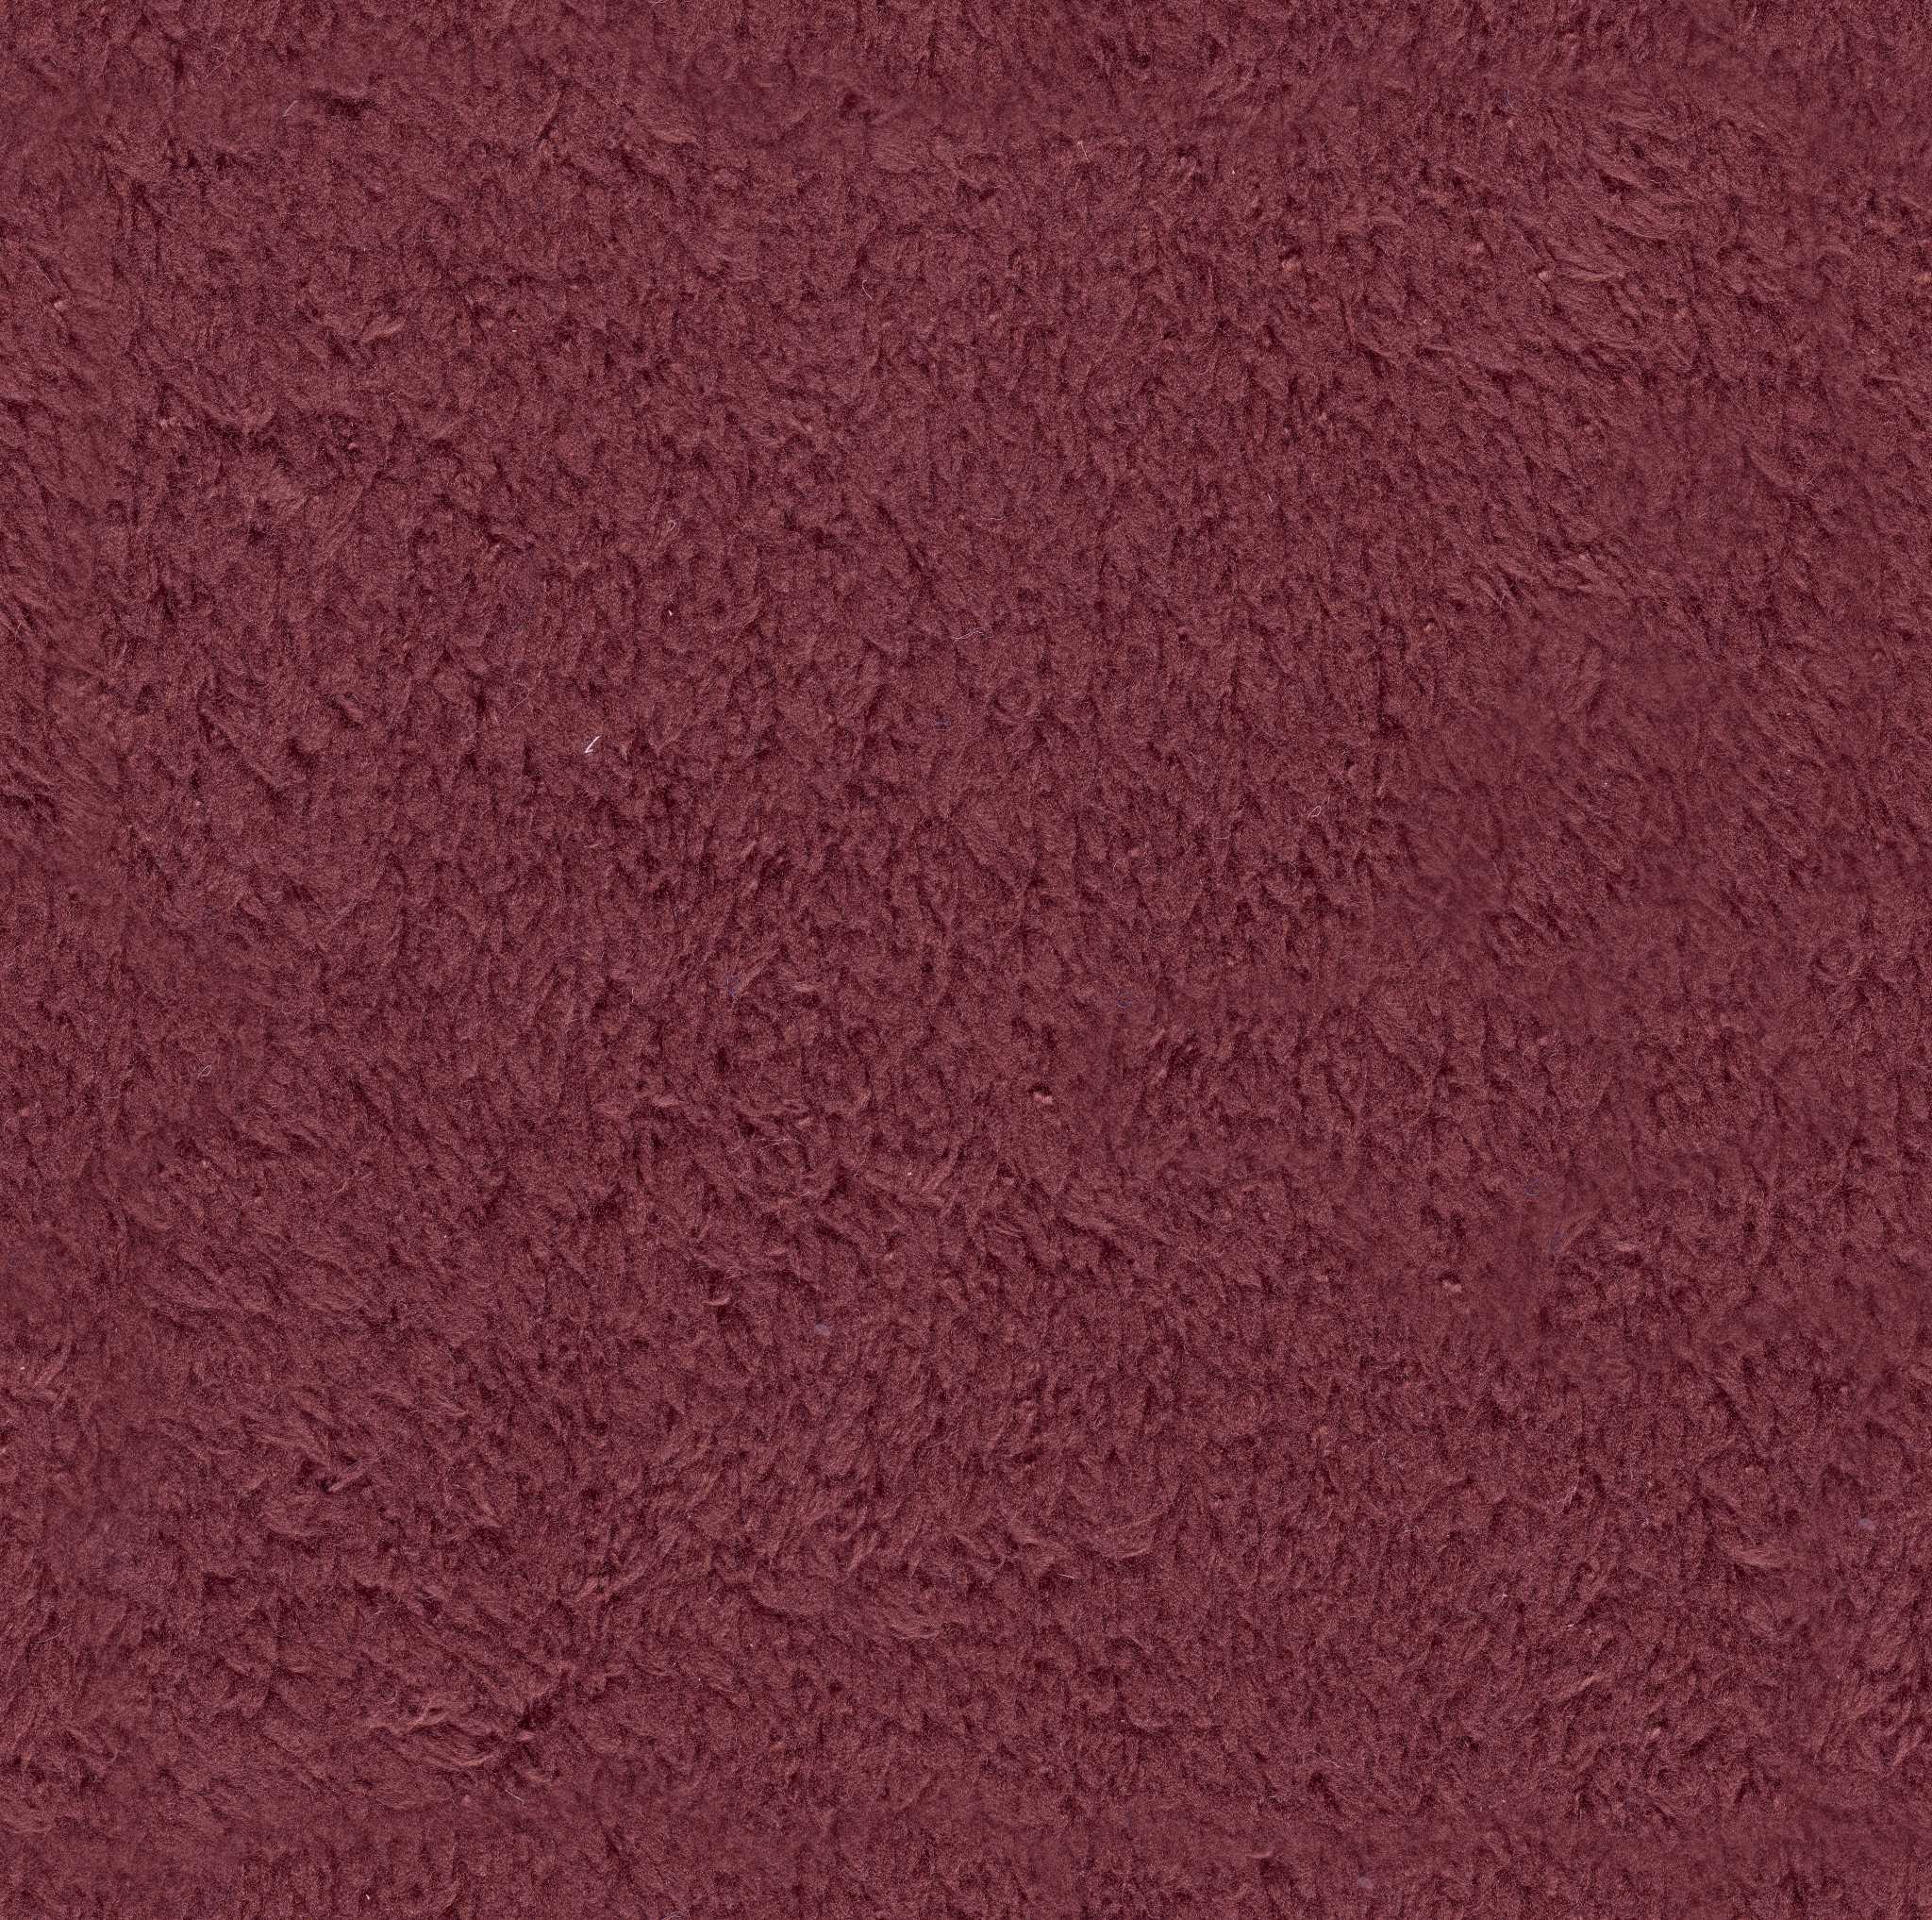 carpet texture redcarpet_s.jpg ... SETWOQP